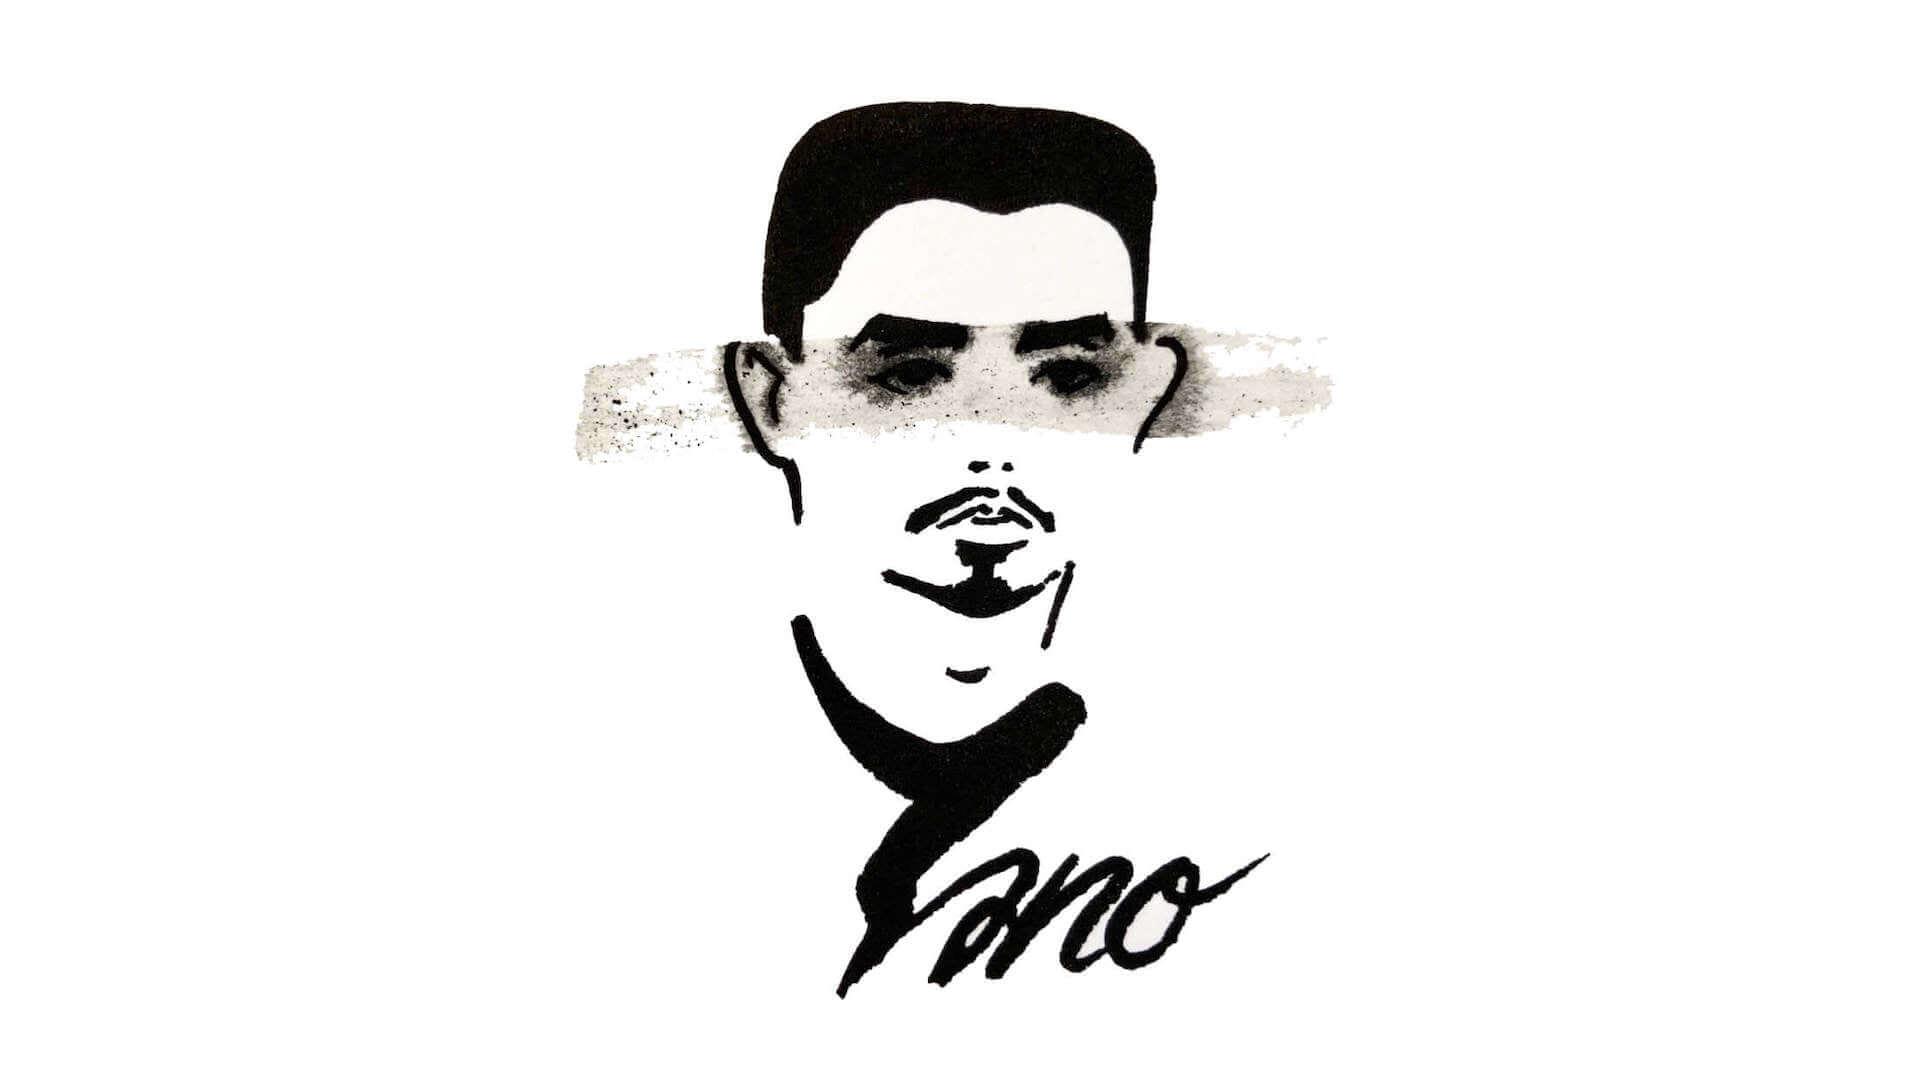 "PEAVISの2ndアルバム『PORTRA¥AL』が本日リリース!鎮座DOPENESSを迎えた収録曲""マゴコロ""のMVは今夜公開 music210120_peavis_6-1920x1083"